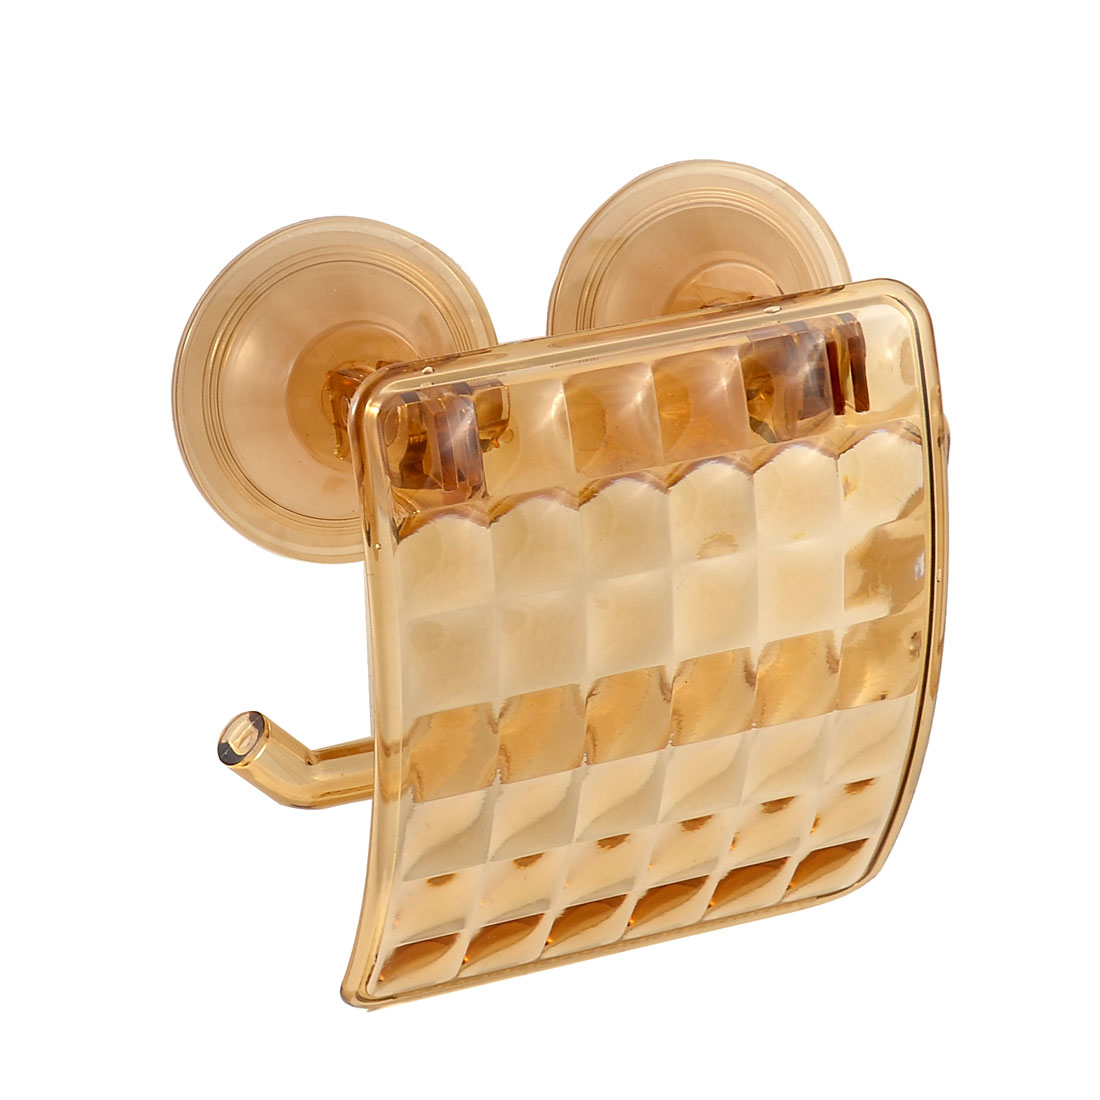 Bathroom Shower Suction Cup Toilet Paper Tissue Hanger Holder Amber Color